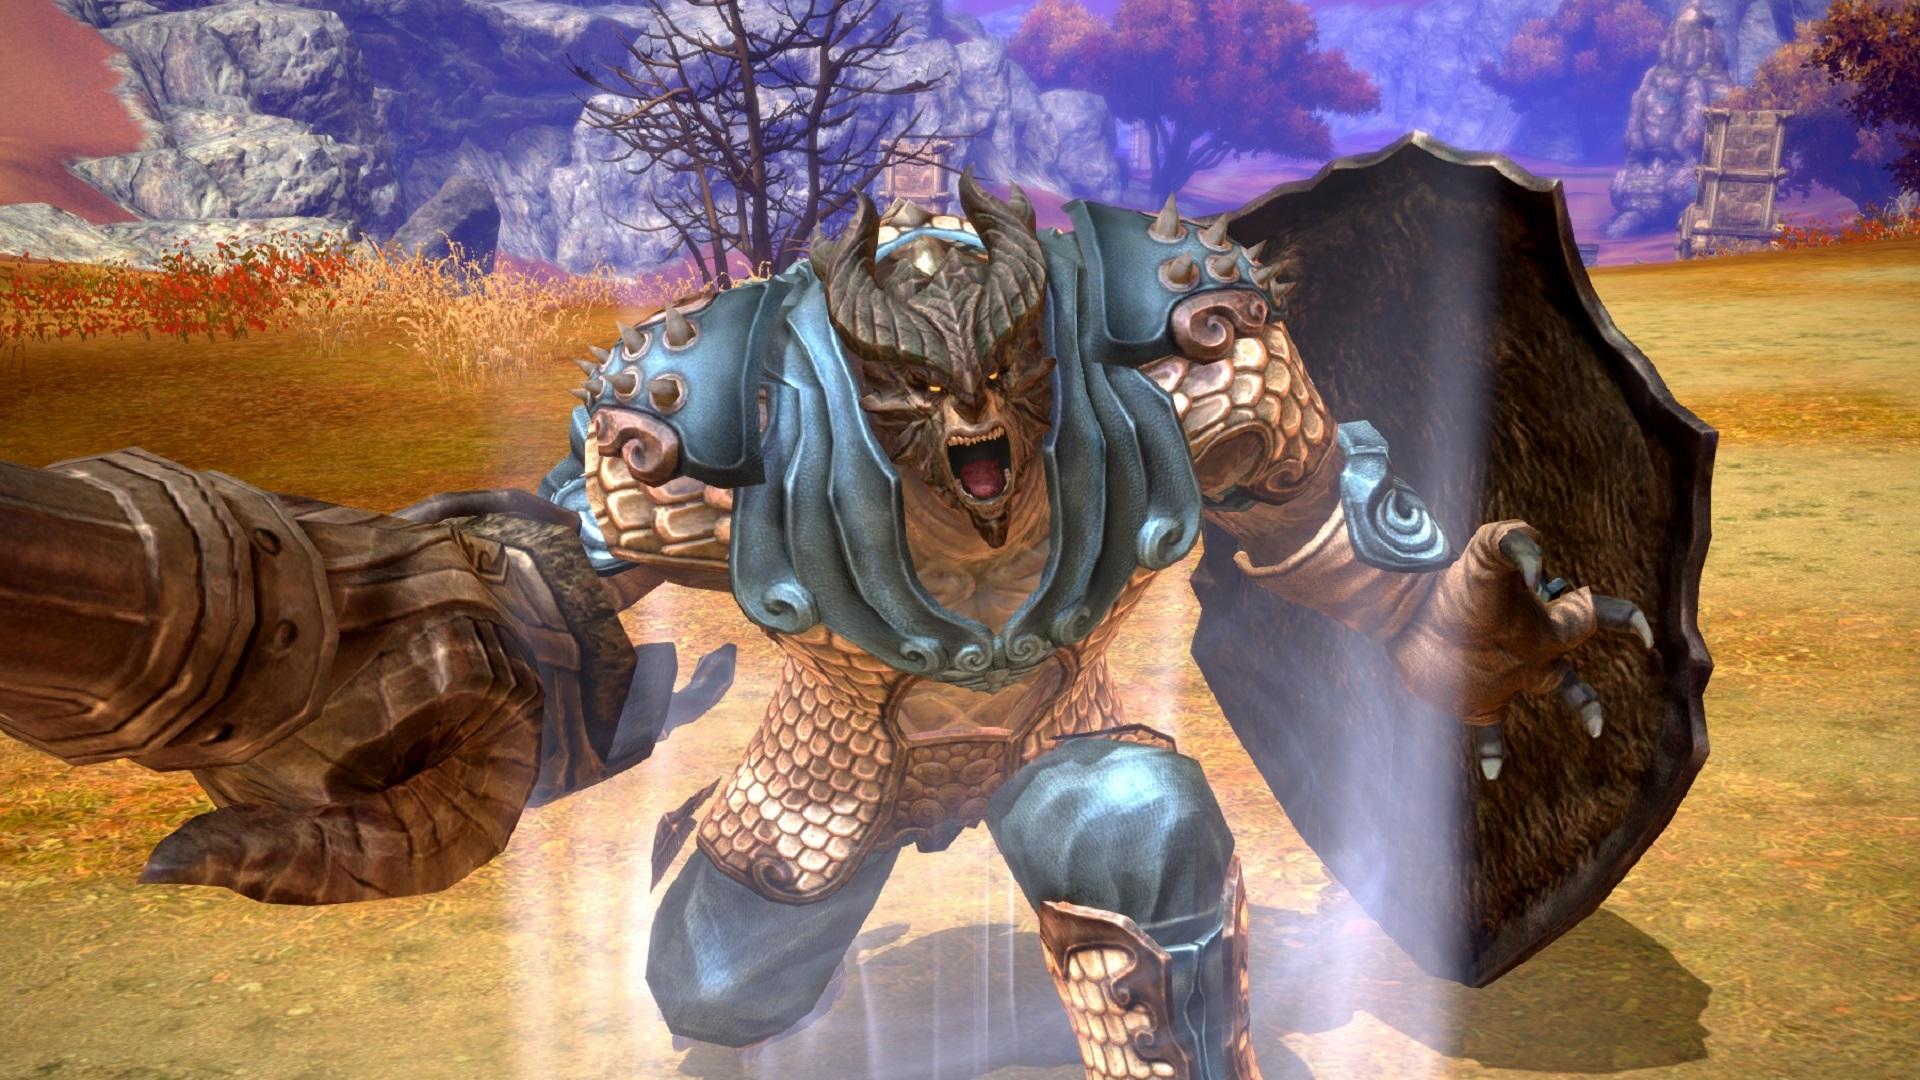 RPG Games - Free Game Downloads | GameTop